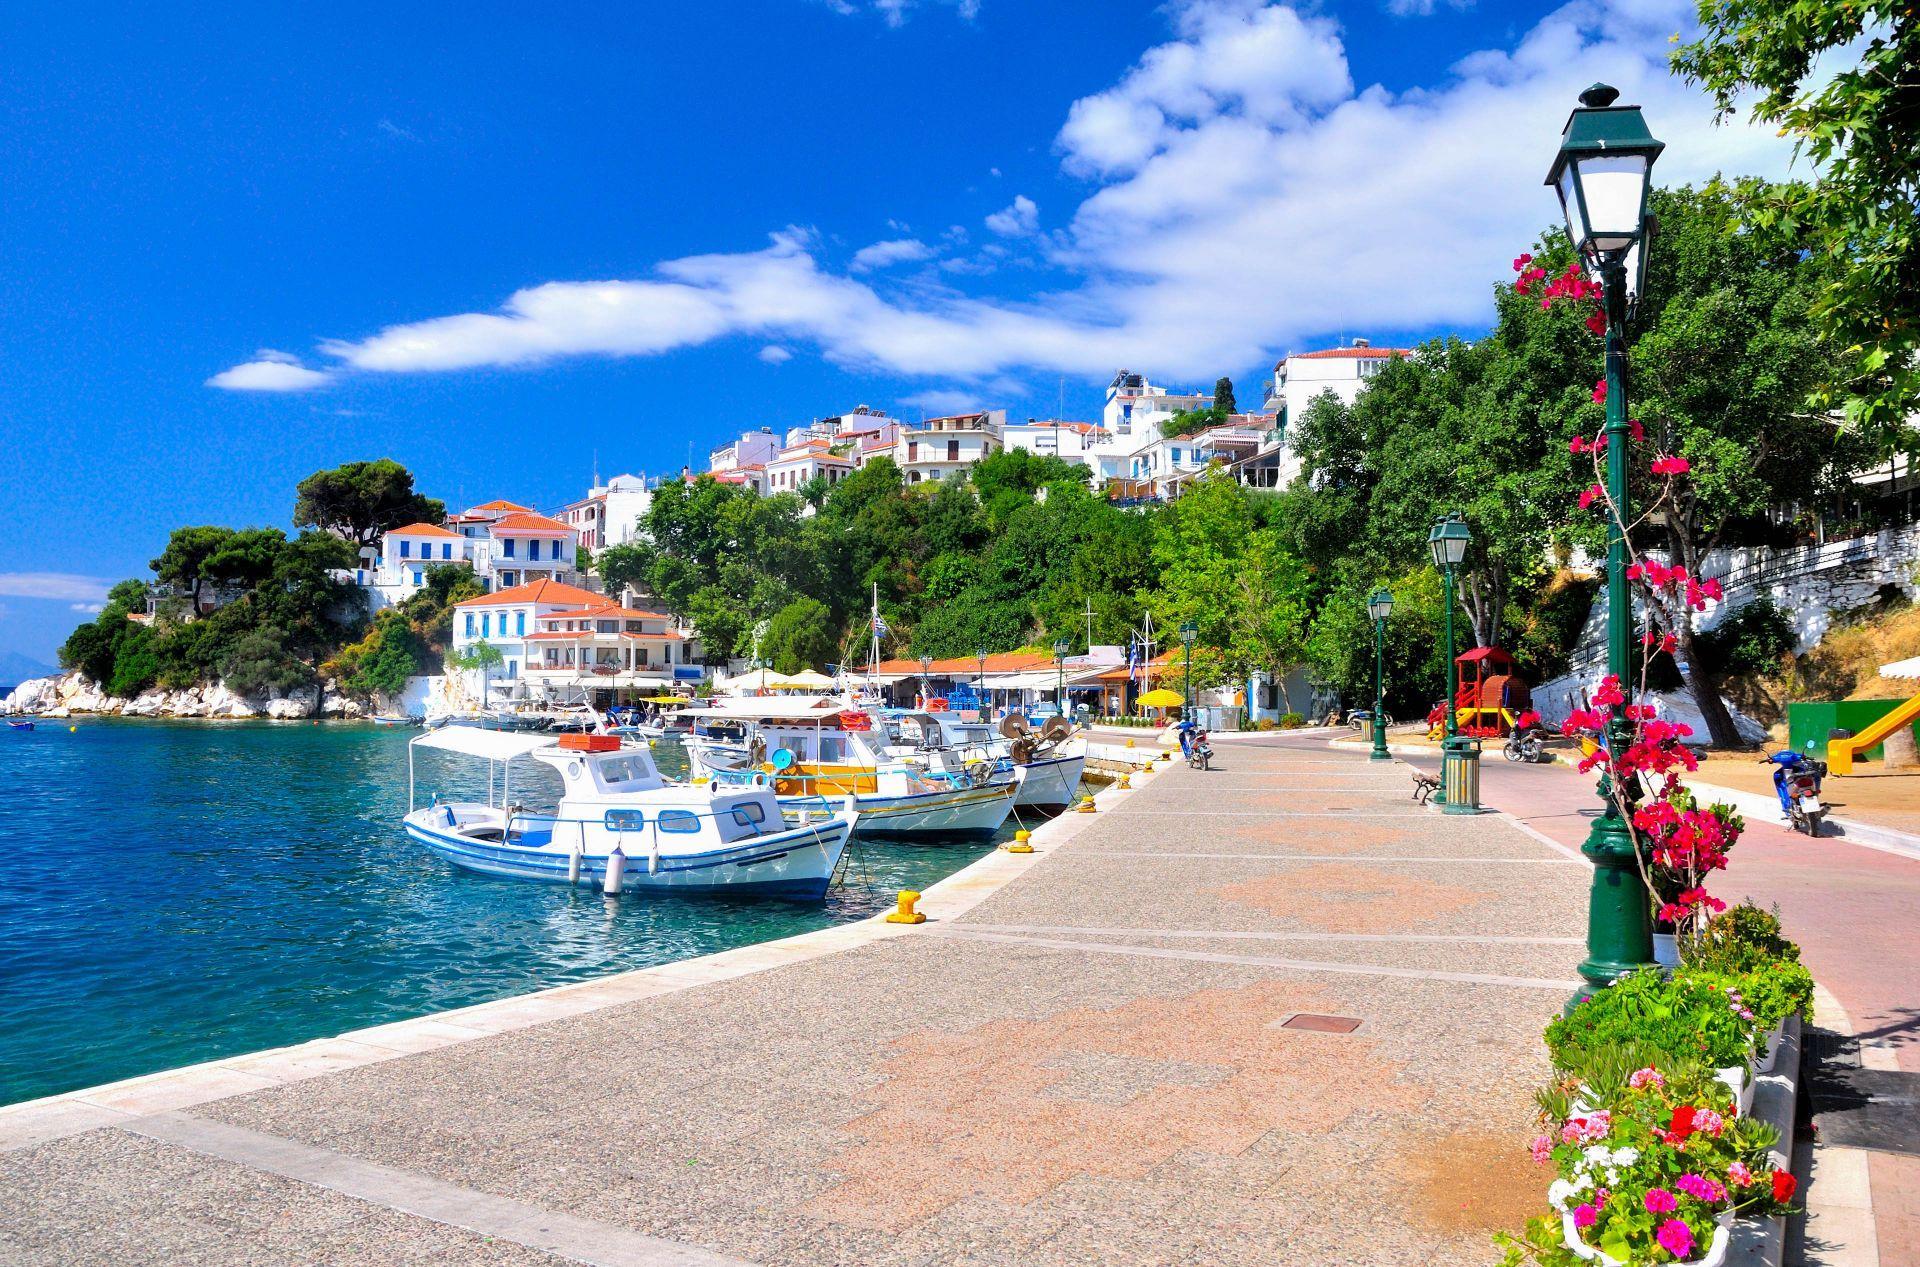 Sporades islands: The main town of Skiathos island